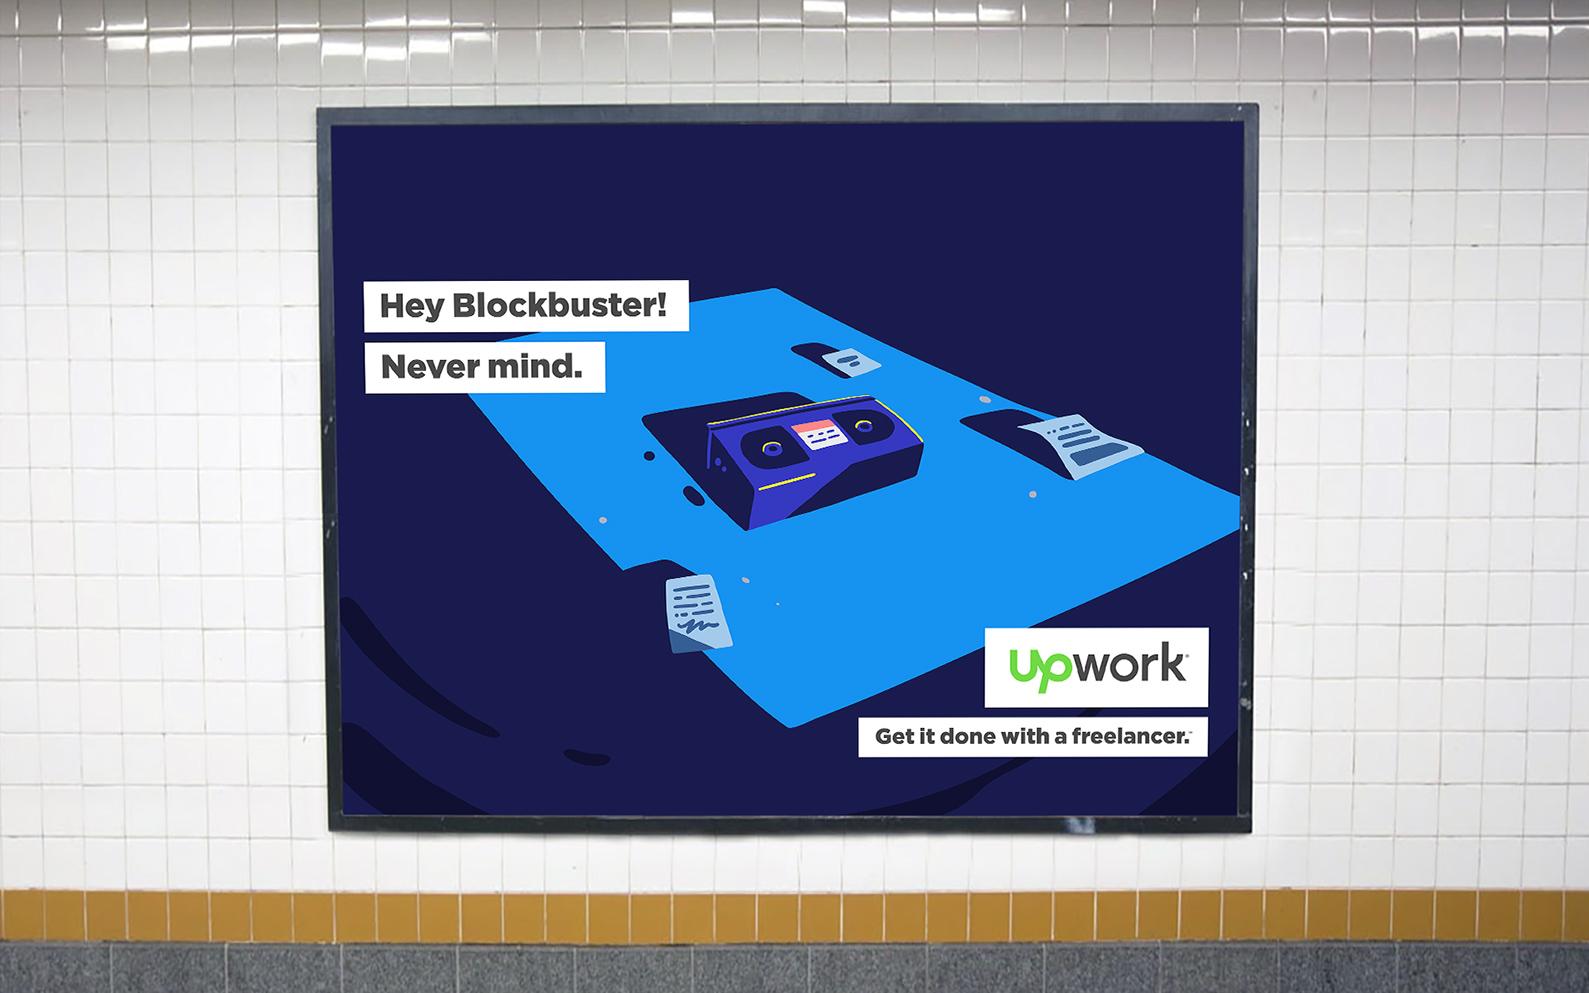 Upwork-aOOH-Hey-Blockbuster.jpg